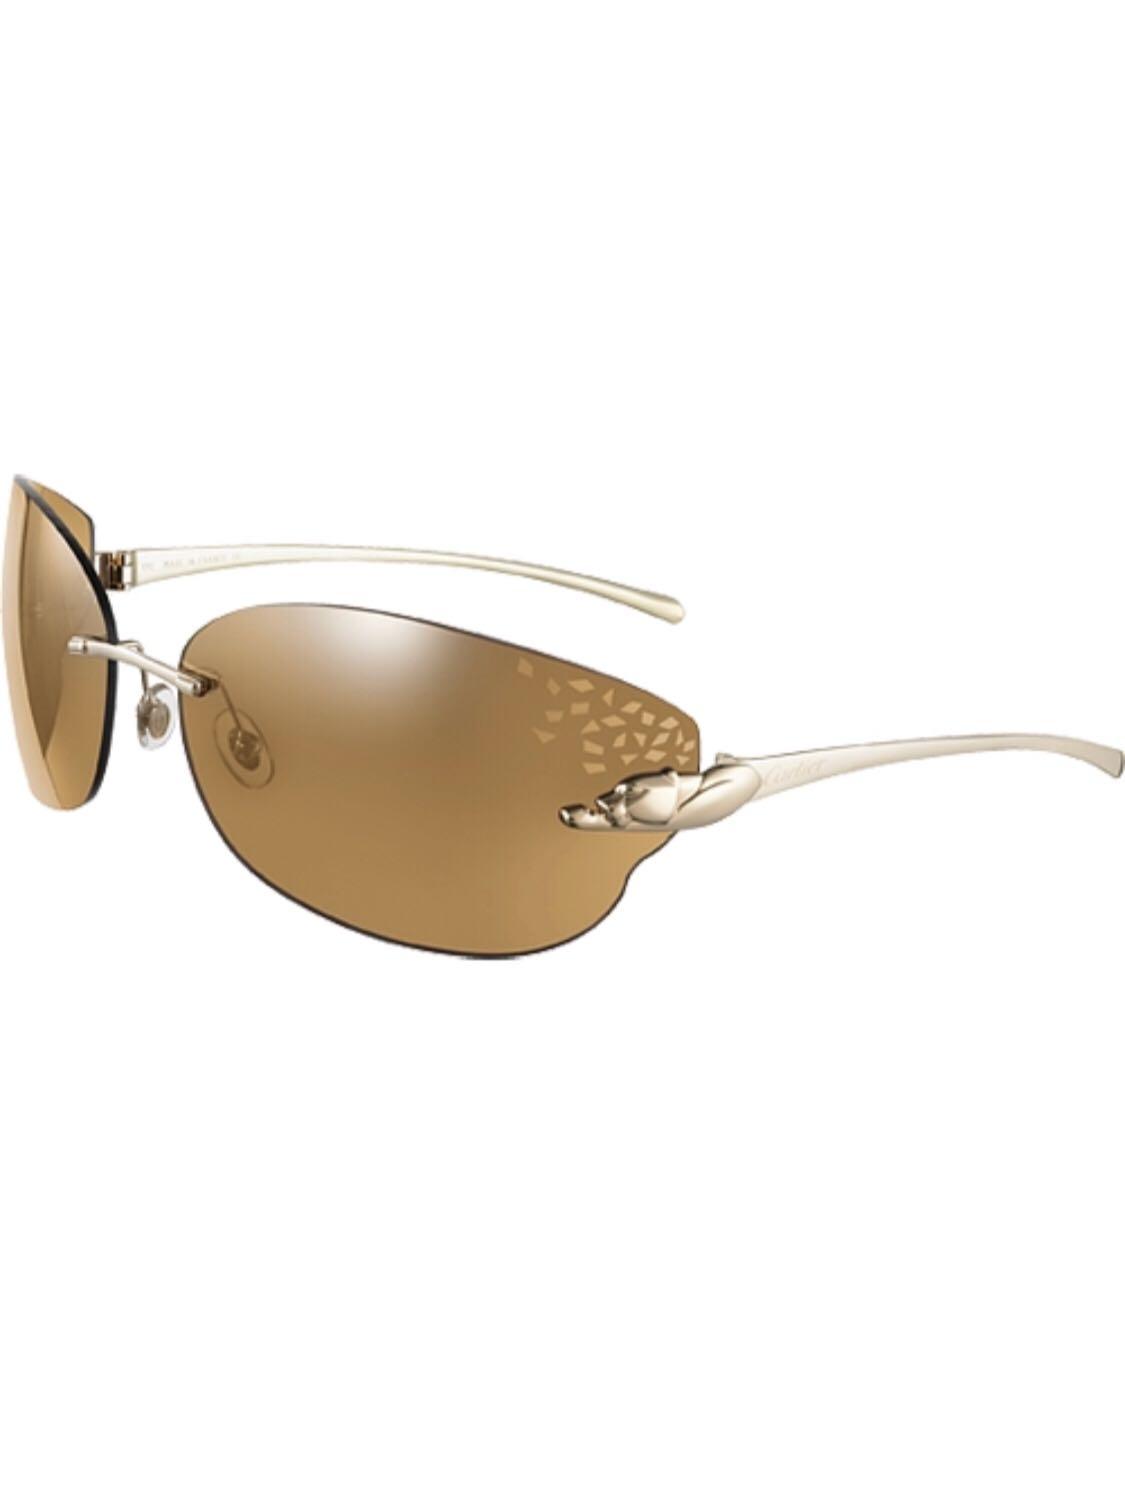 4b91787606c Cartier Panthere Sunglasses